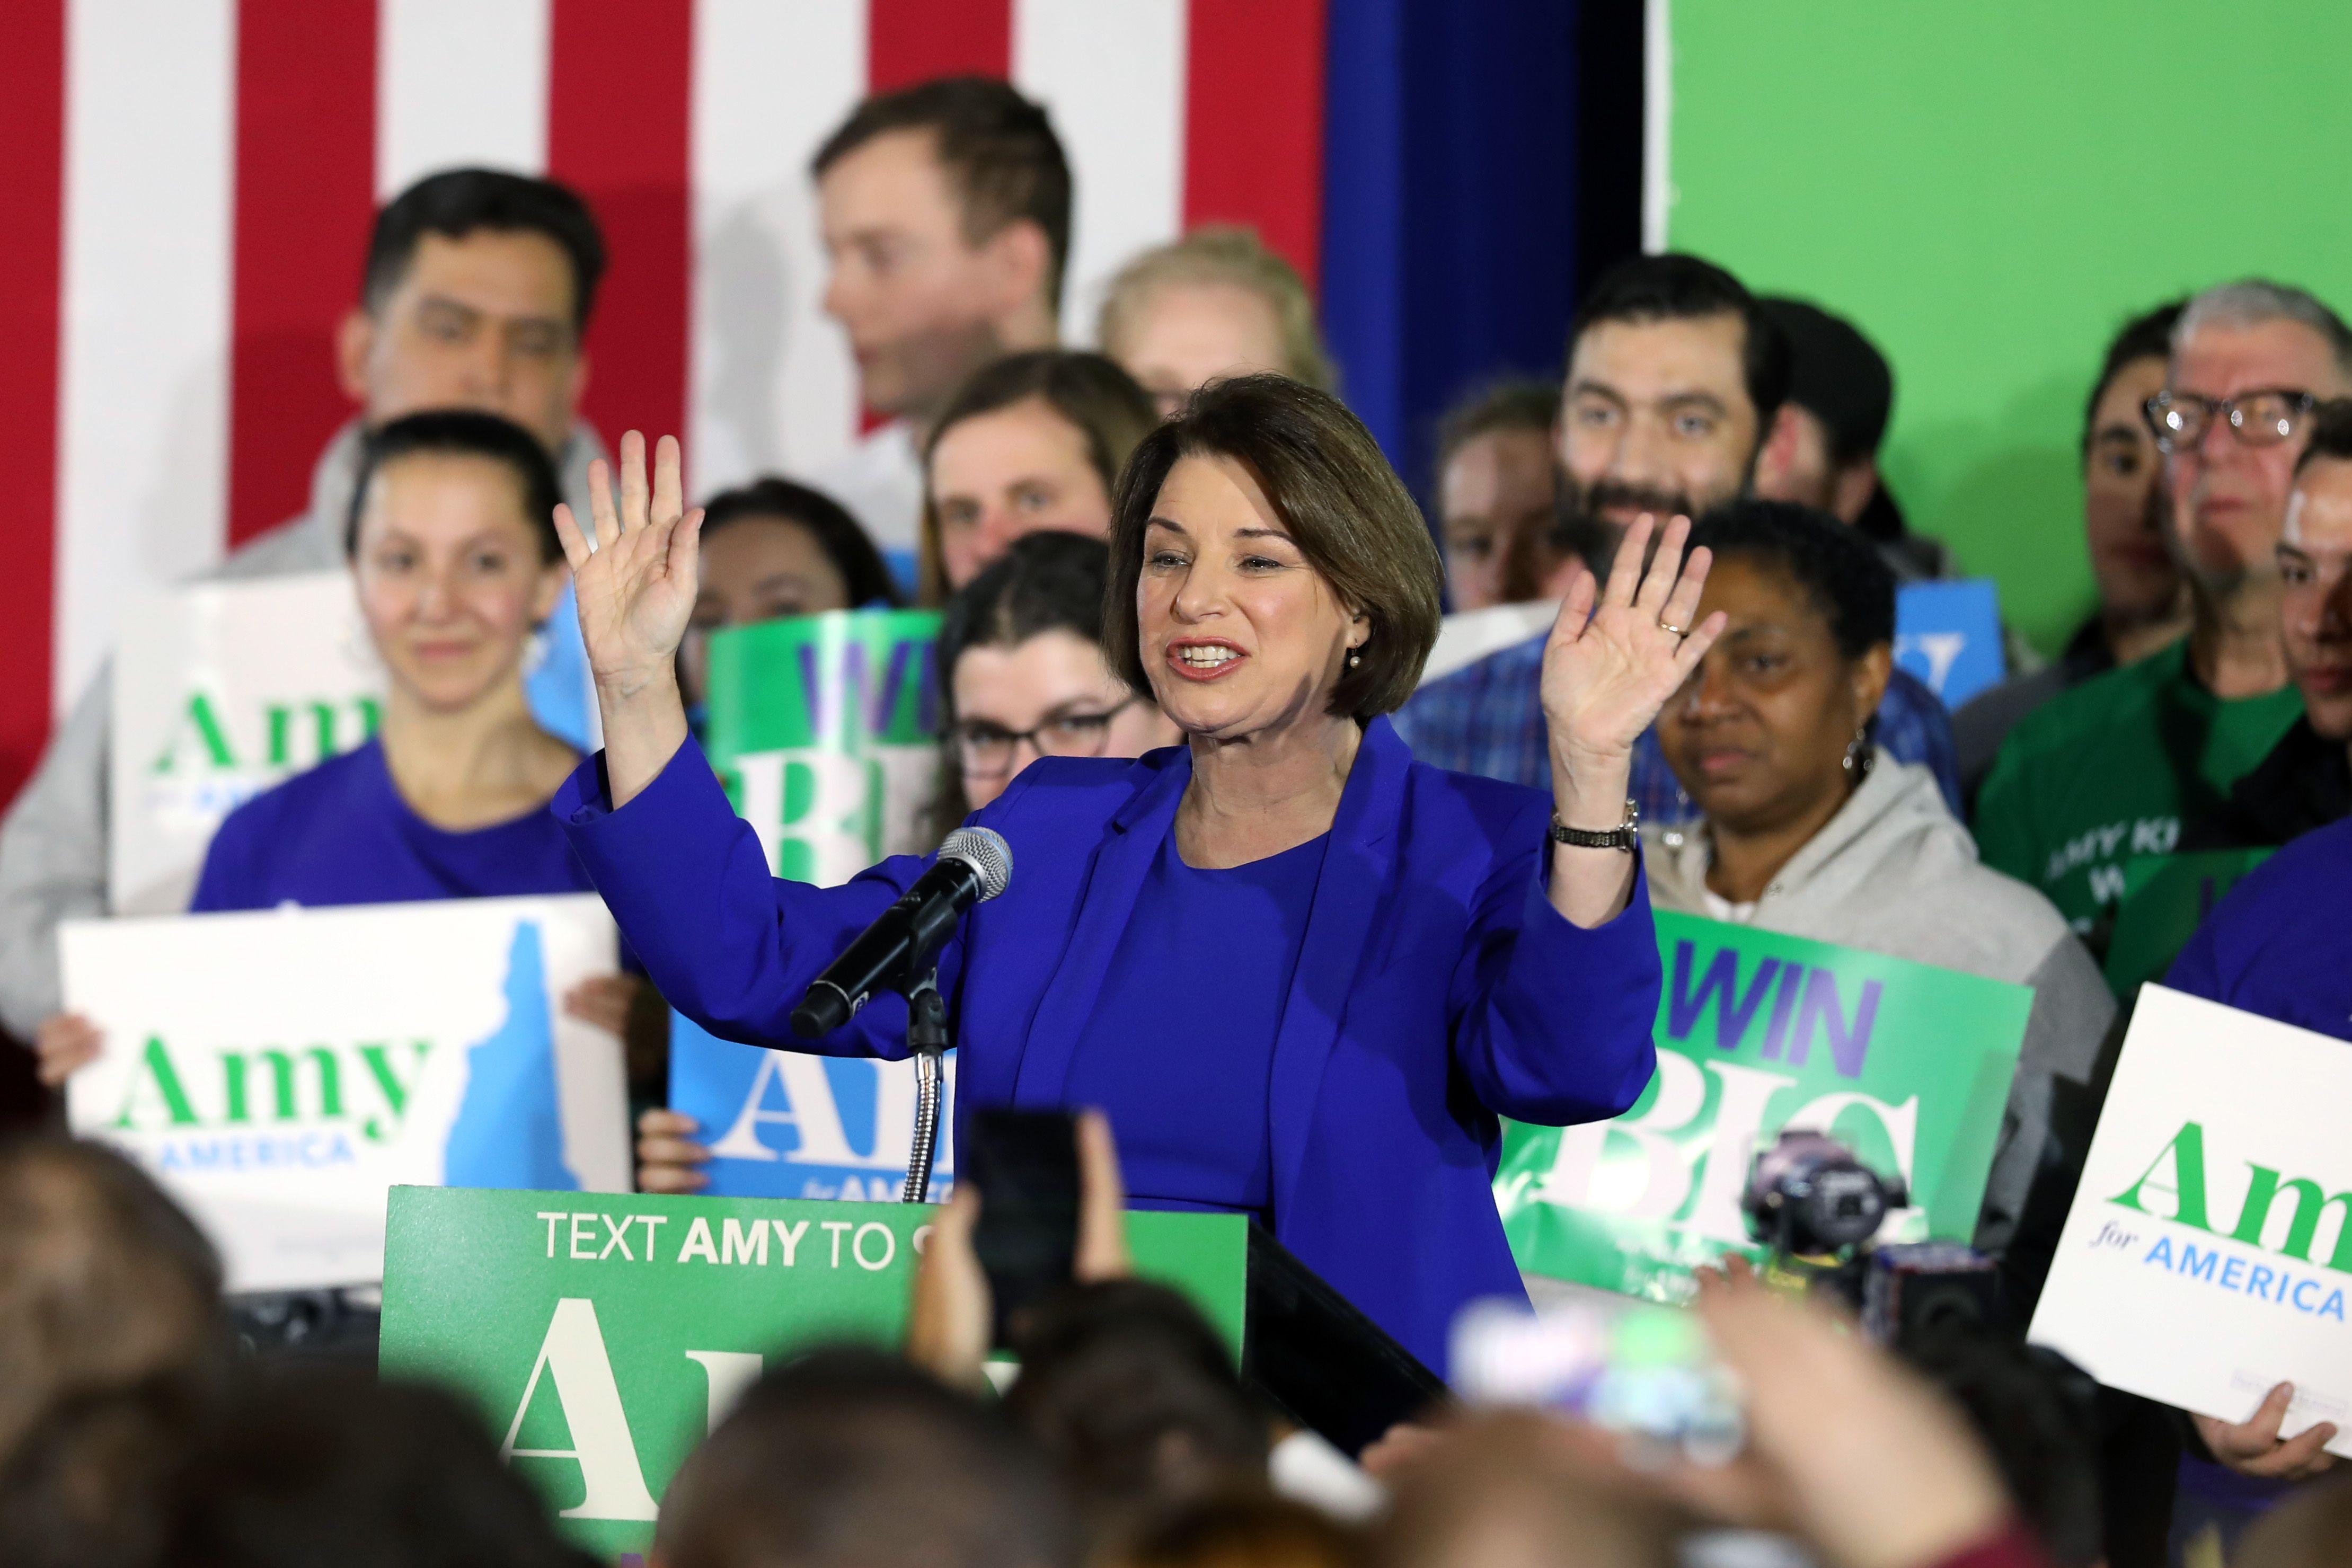 Klobuchar says she has raised $12 million since New Hampshire debate - Axios